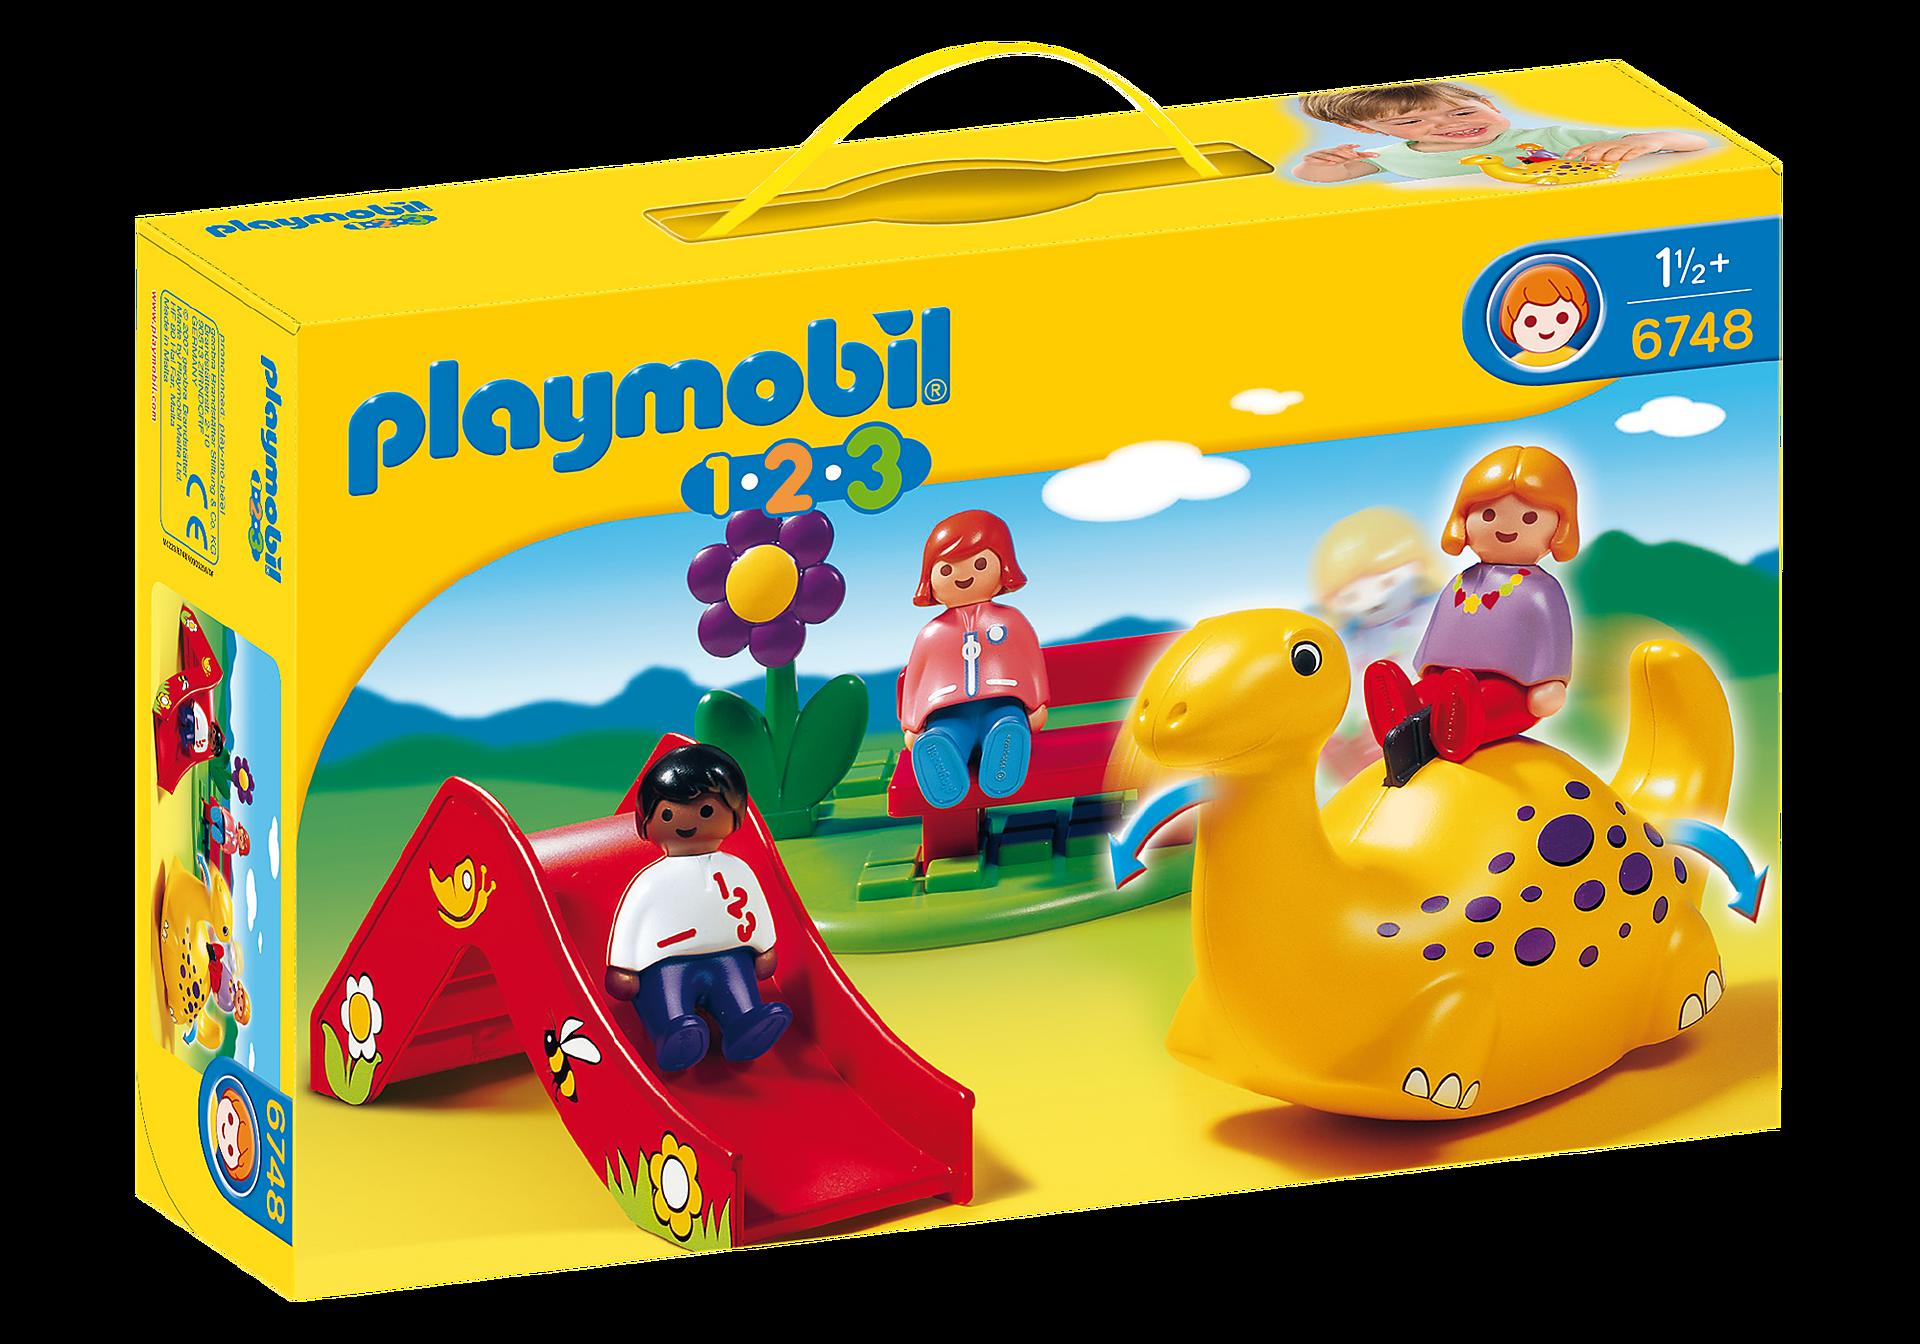 http://media.playmobil.com/i/playmobil/6748_product_box_front/Kinderspielplatz